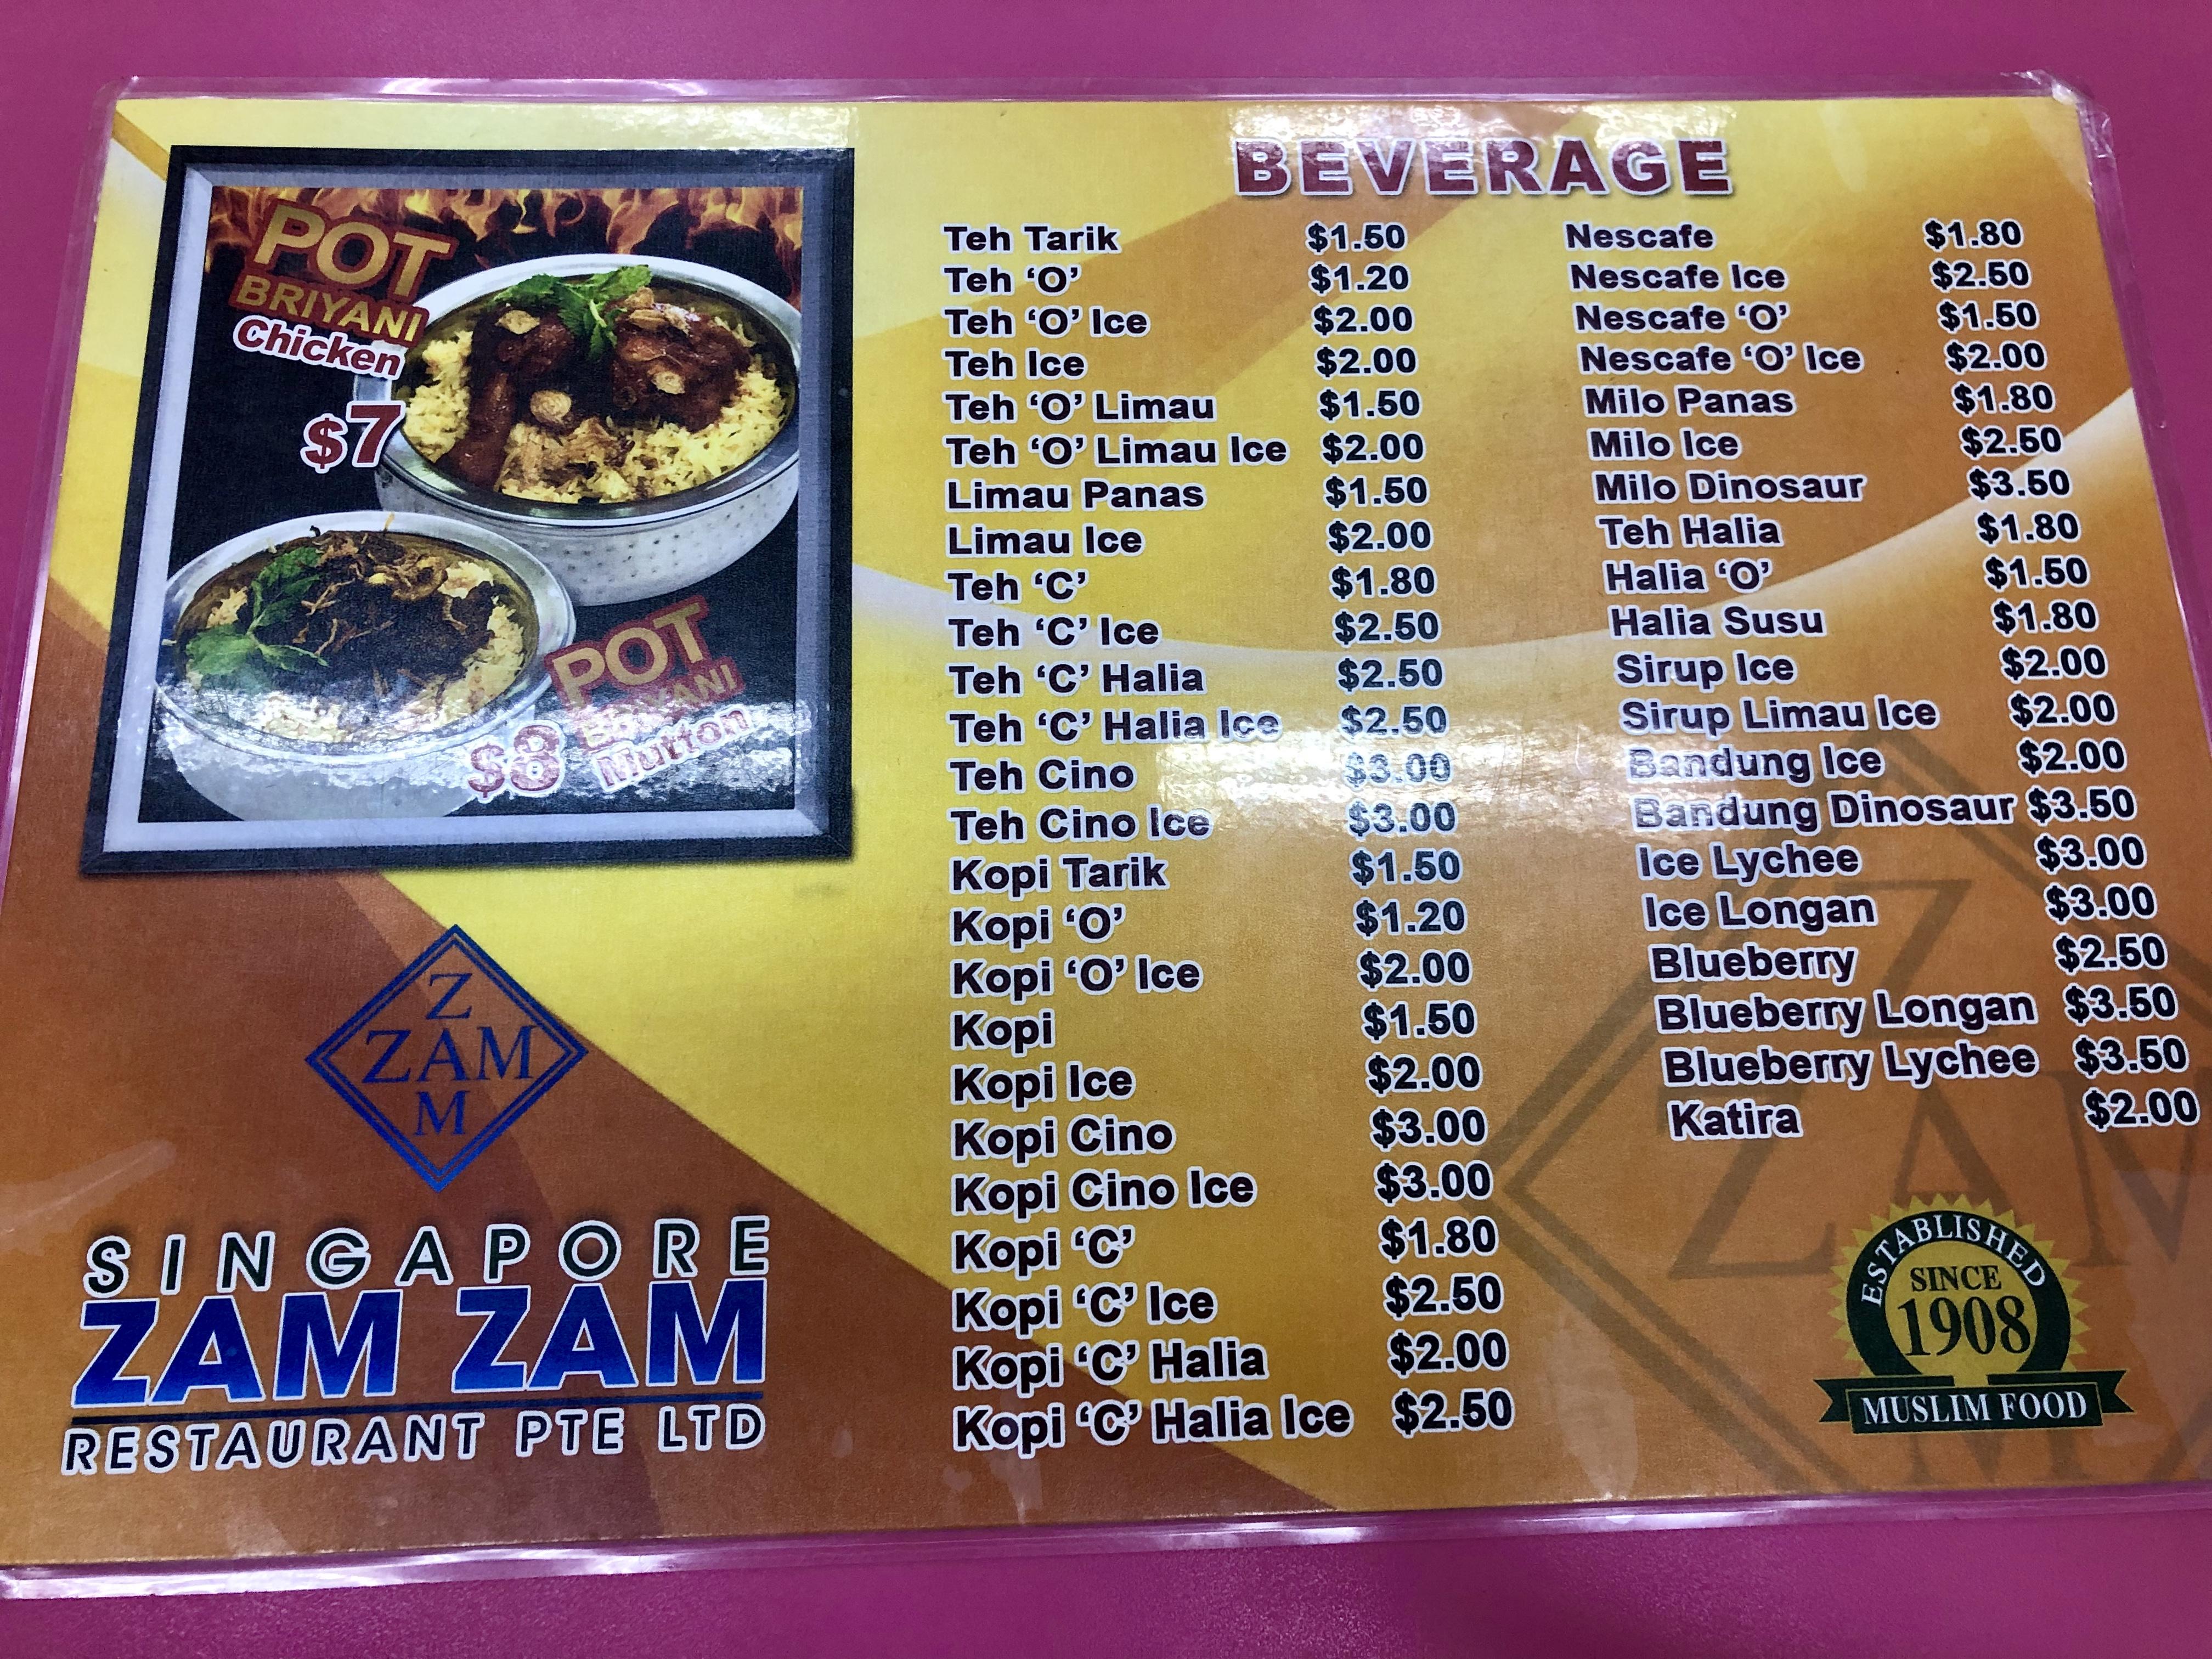 "SG_food_zamzam_019"""""